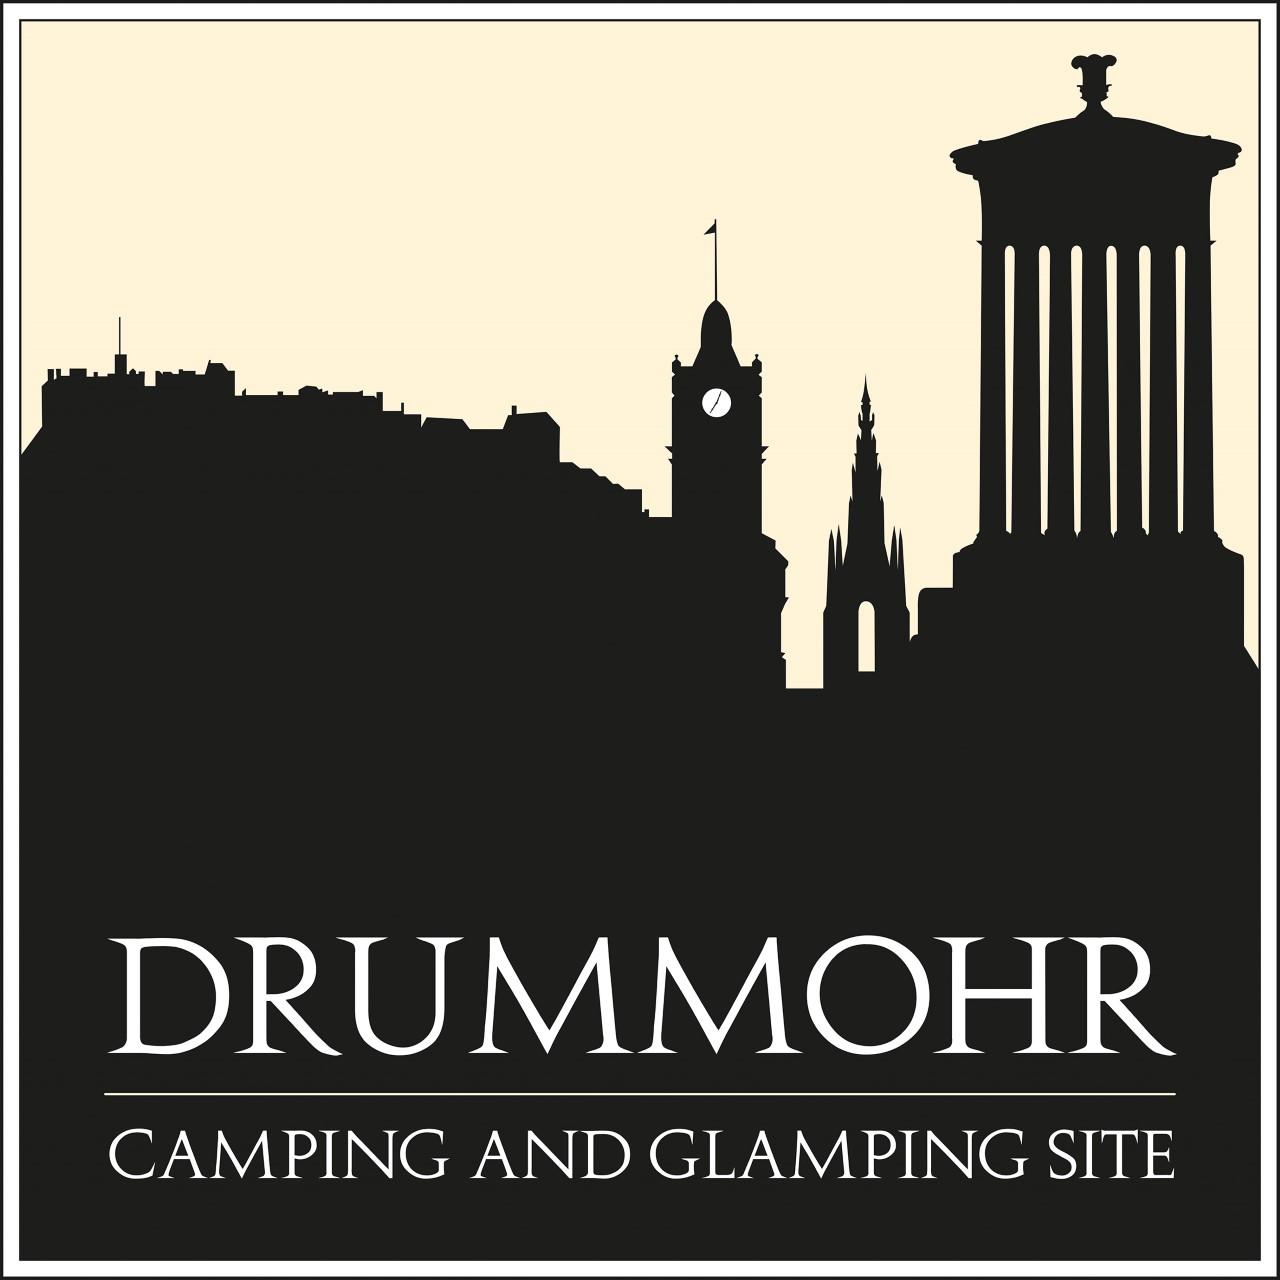 Drummohr campsite in scotland